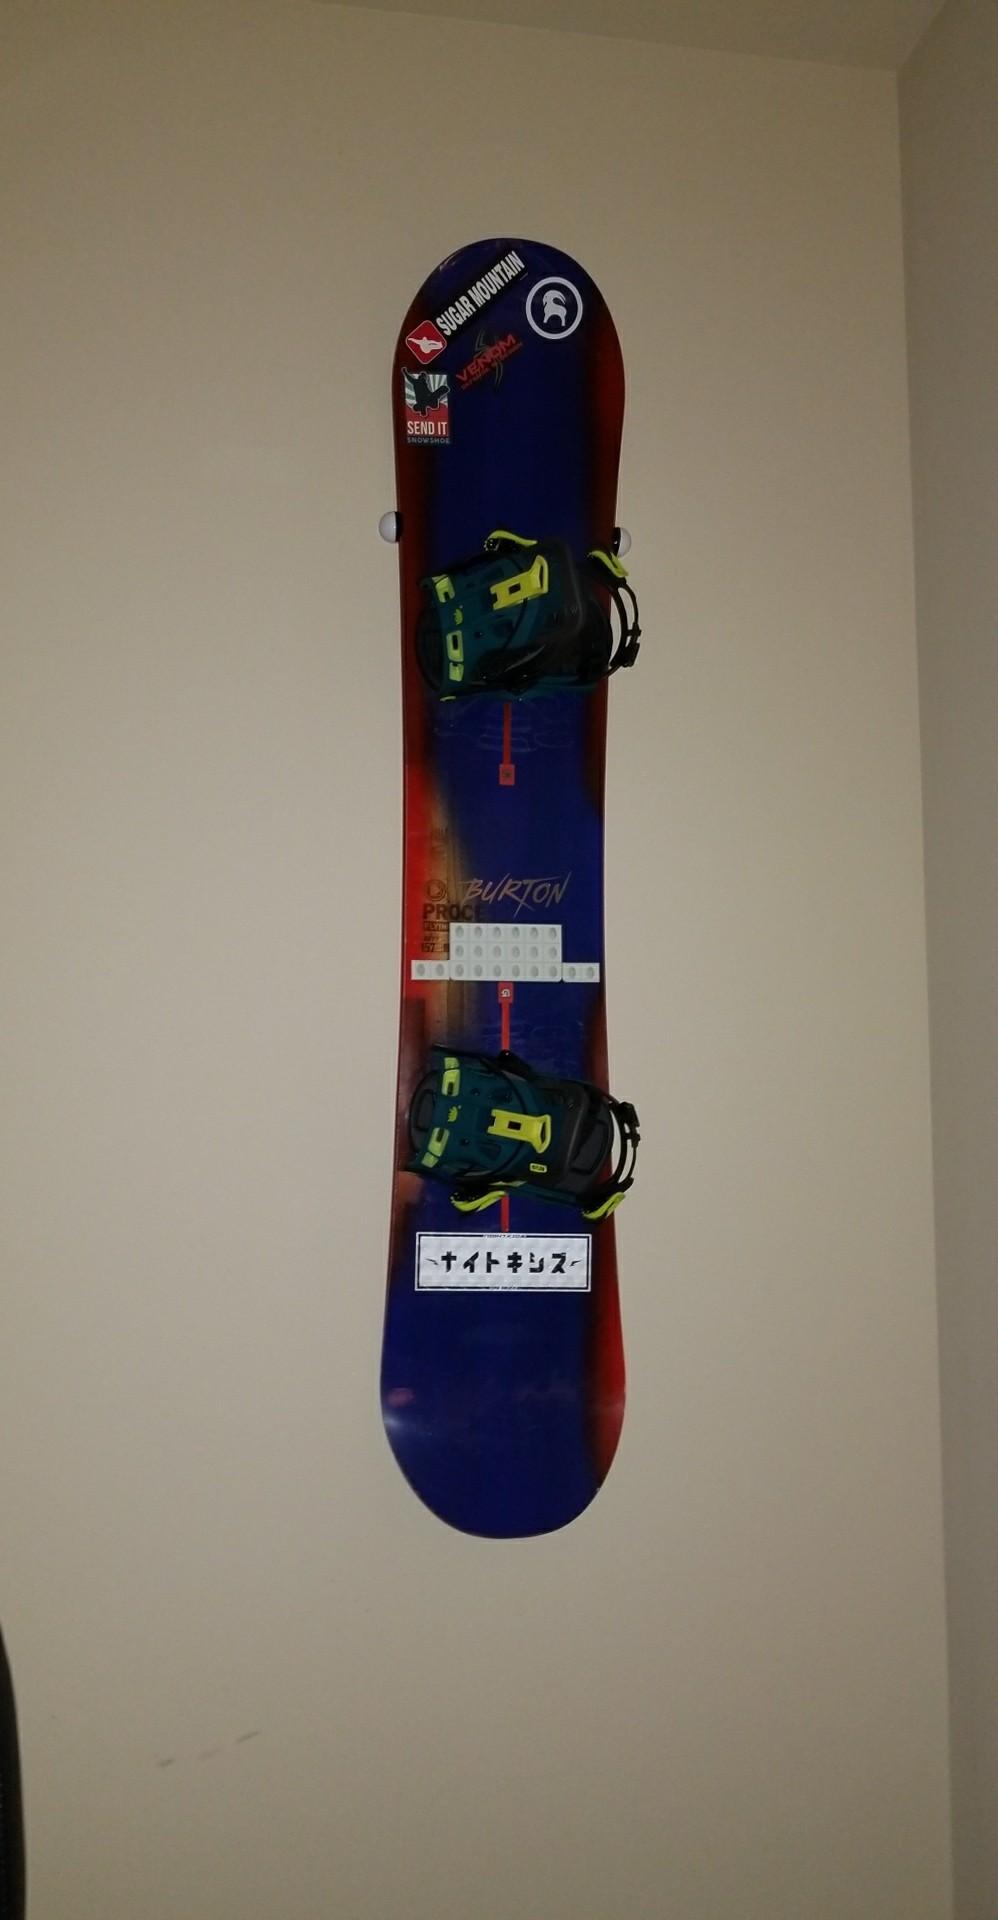 Snowboard Wall Mount Hang Time Storeyourboard Com